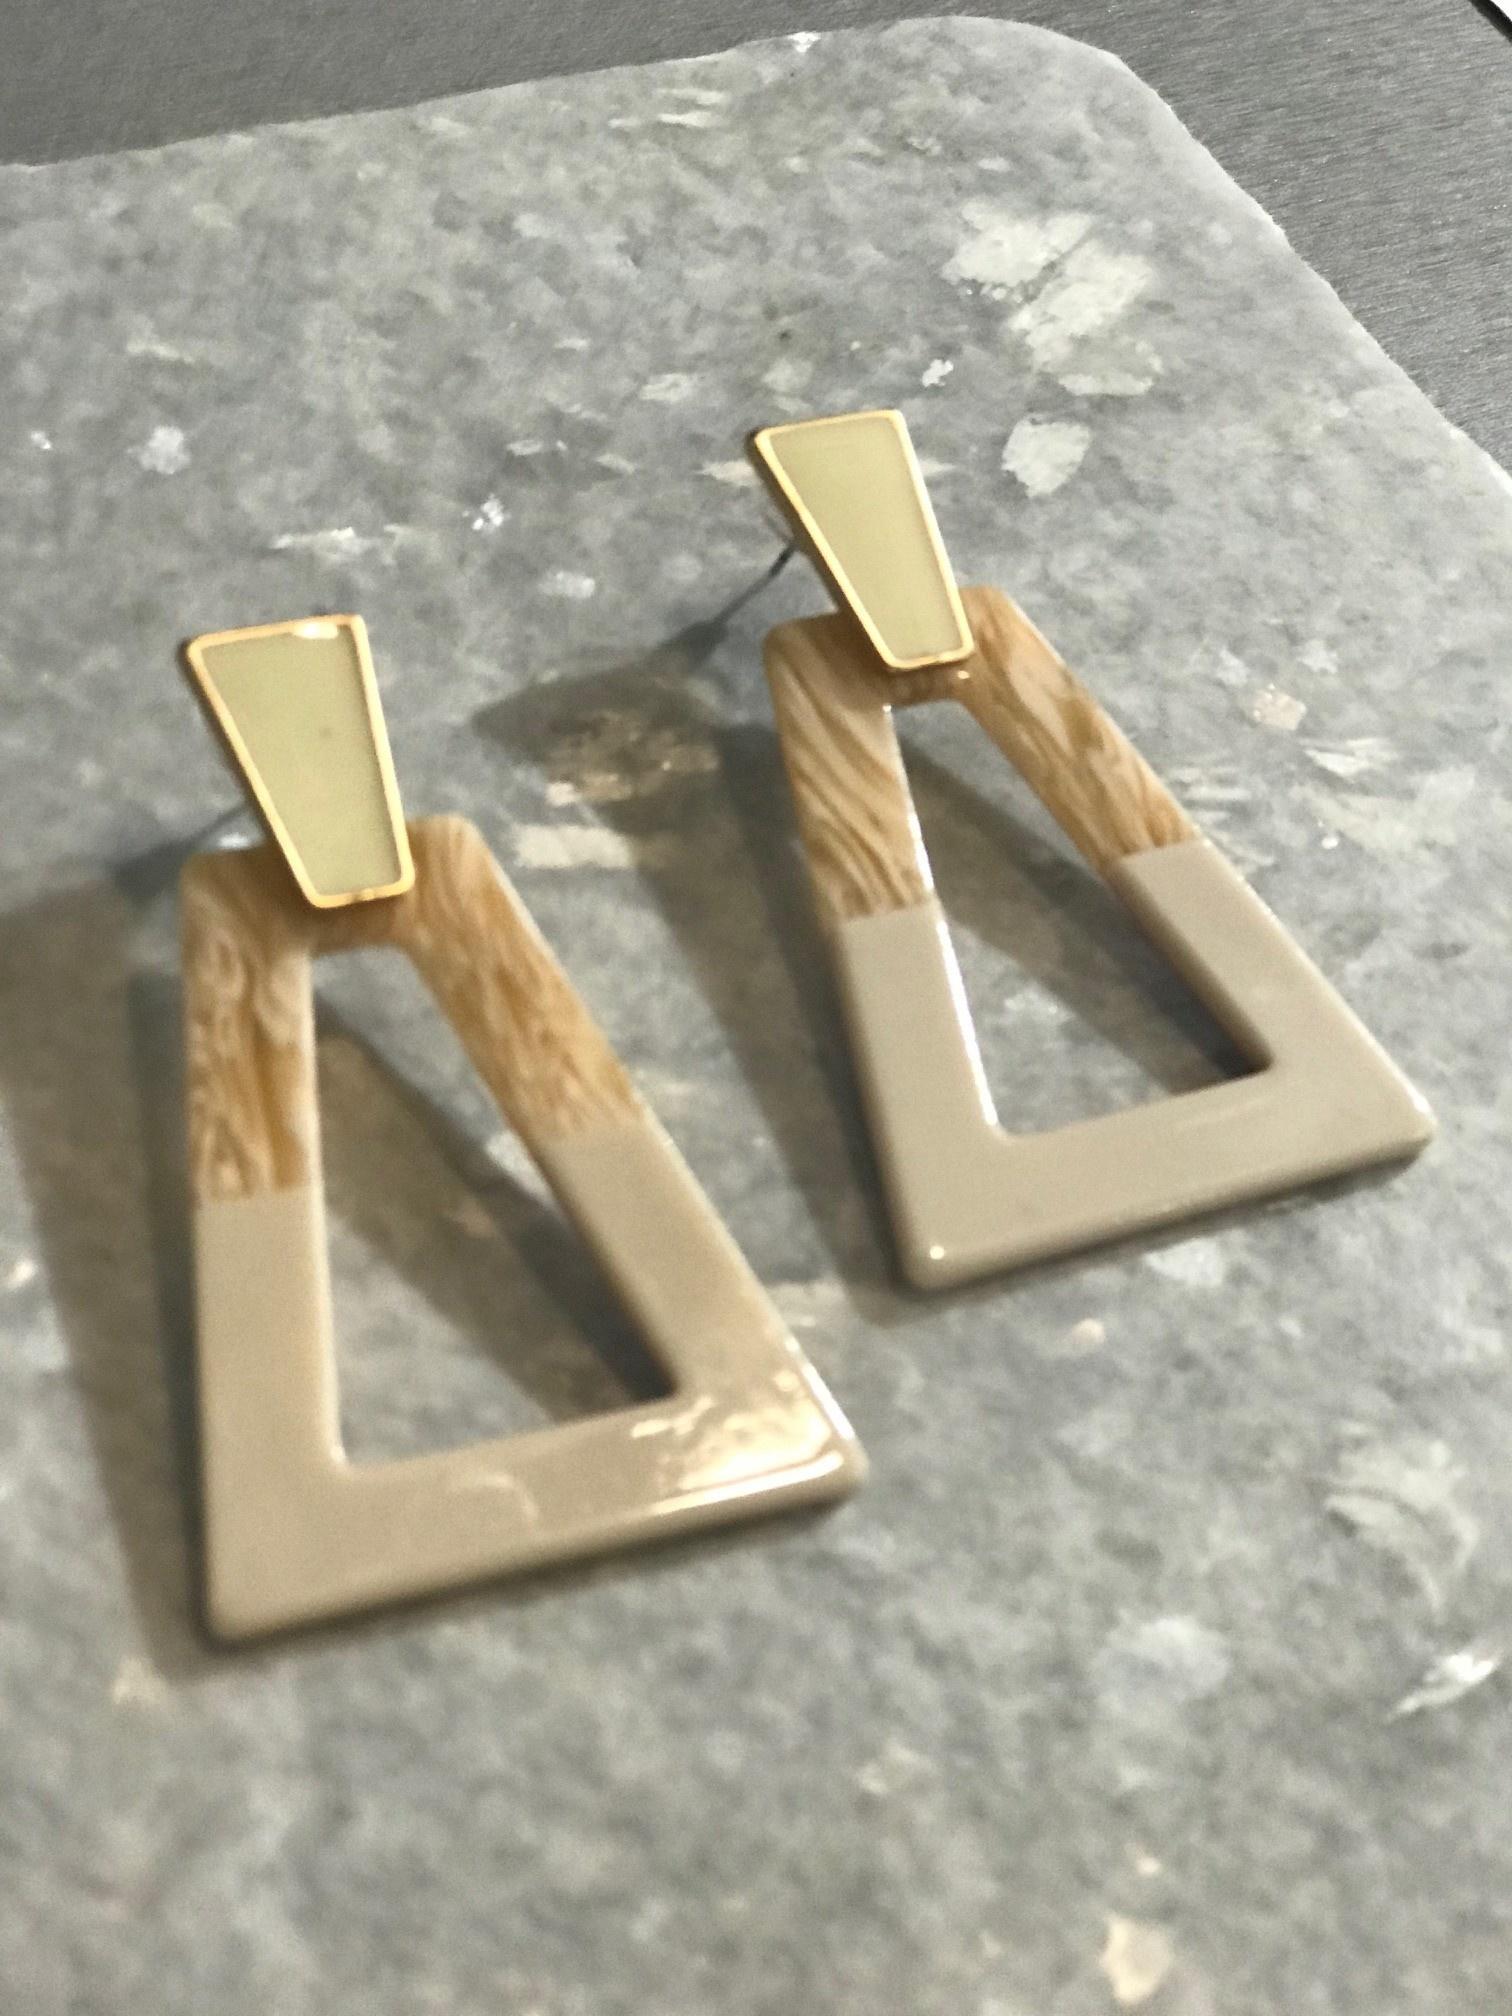 The Workroom Fashion Two-Tone Ivory Traingle Drop Earrings